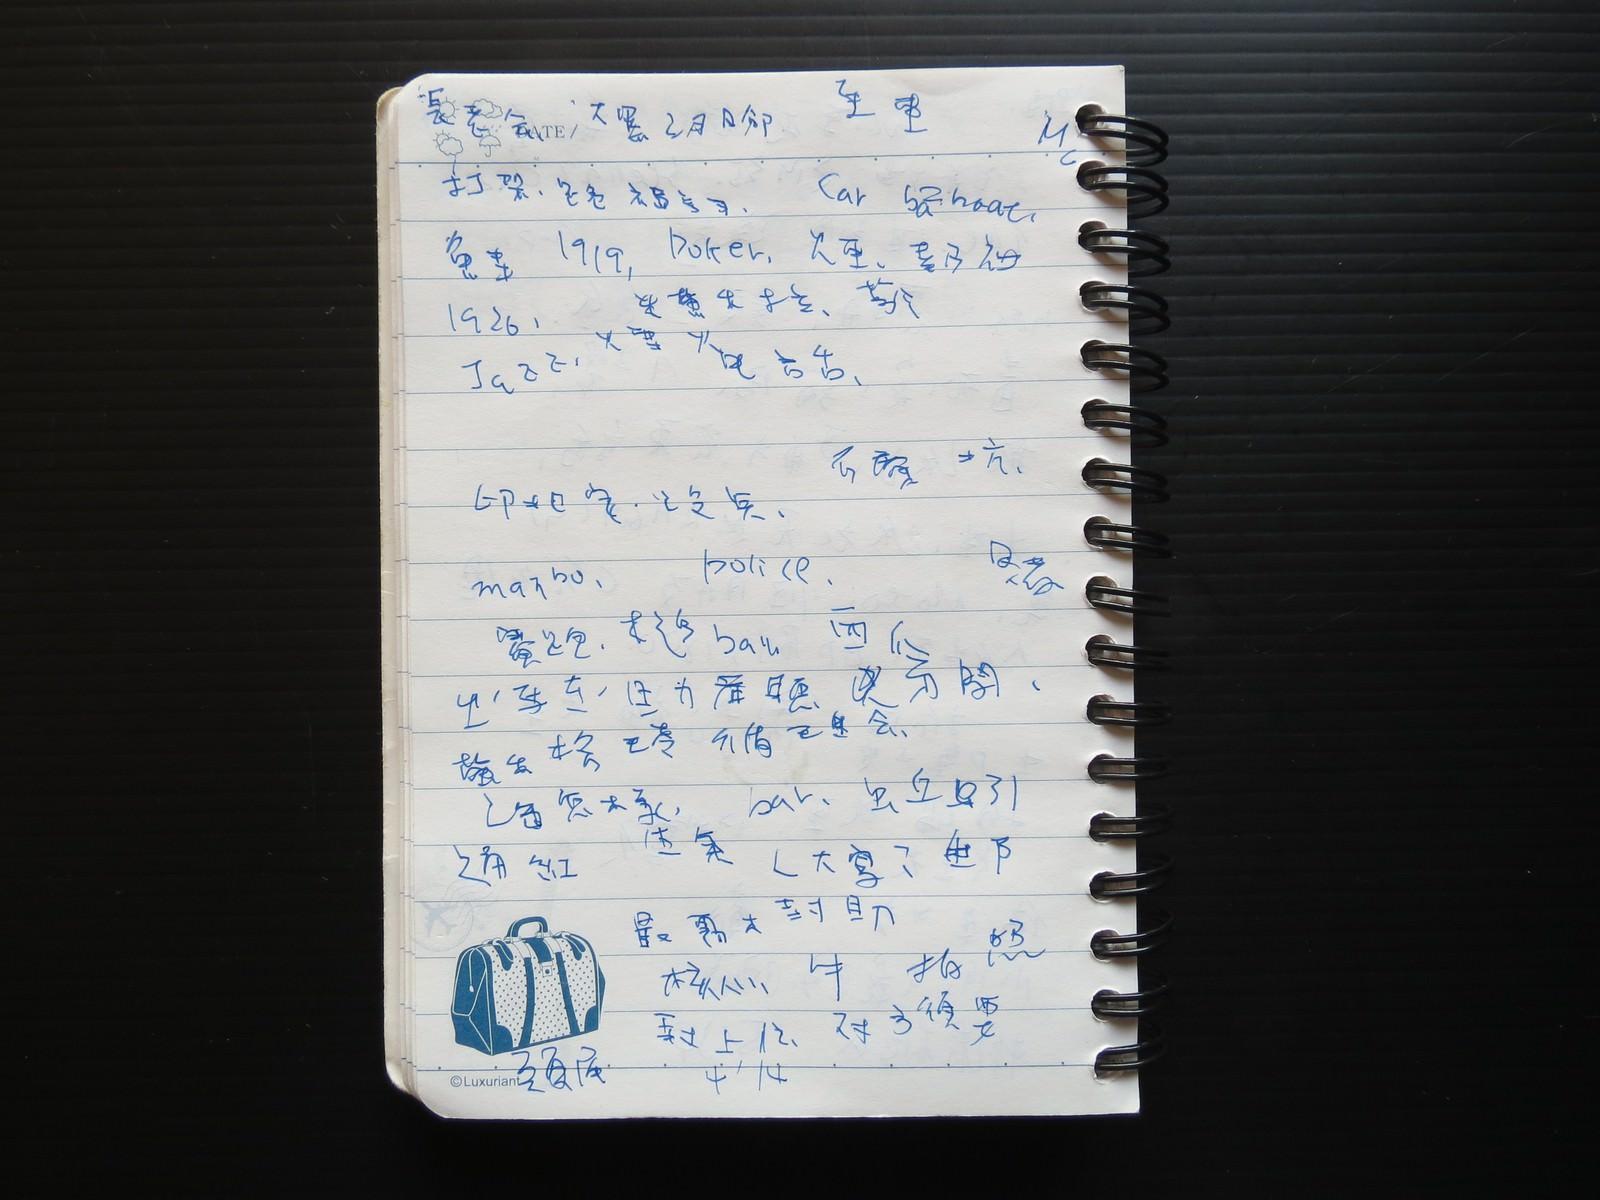 Movie, A River Runs Through It(美國, 1992年) / 大河戀(台灣) / 川流歲月(香港), 心得速記